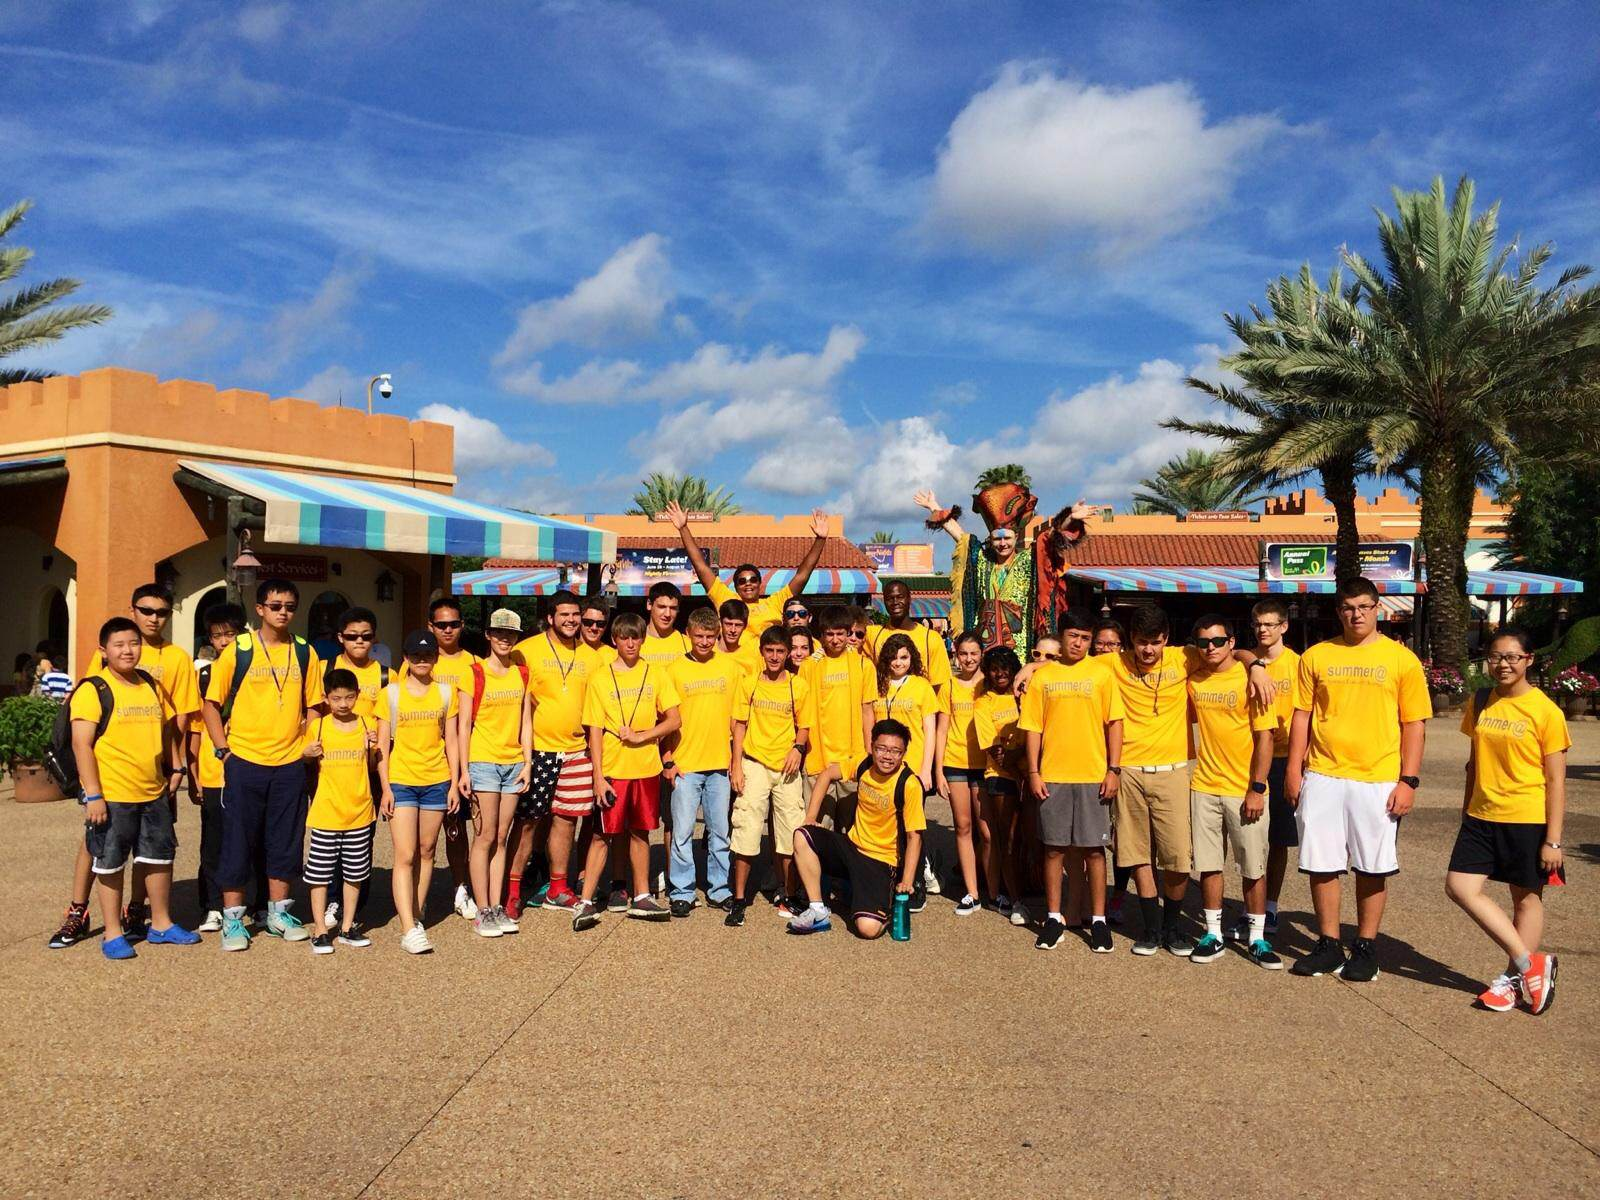 Summer Program - STEM | Summer@Farragut | Fun & Academic Boarding Experience in Florida